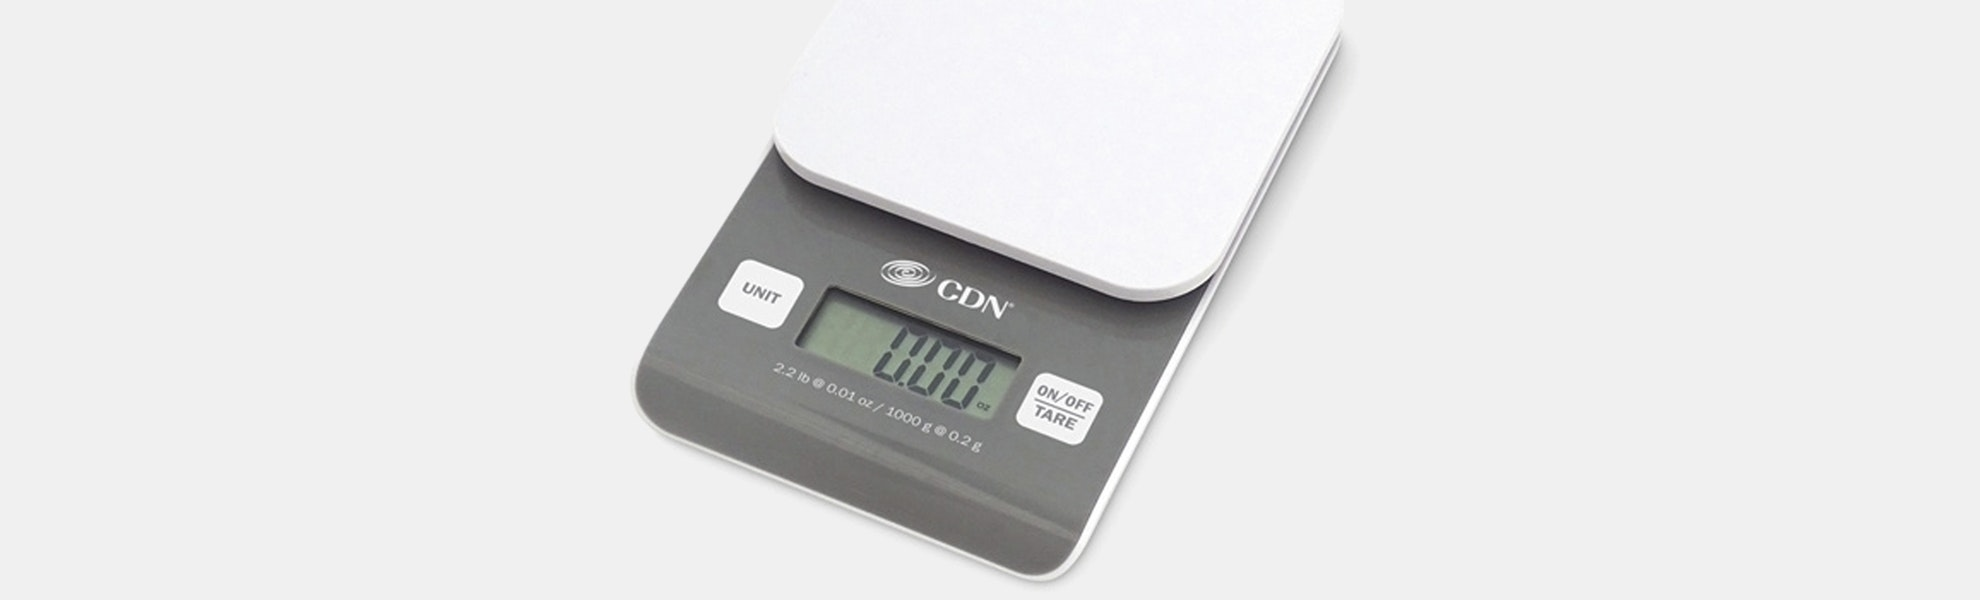 CDN Digital Precision Scale (2 lb/1,000 g)